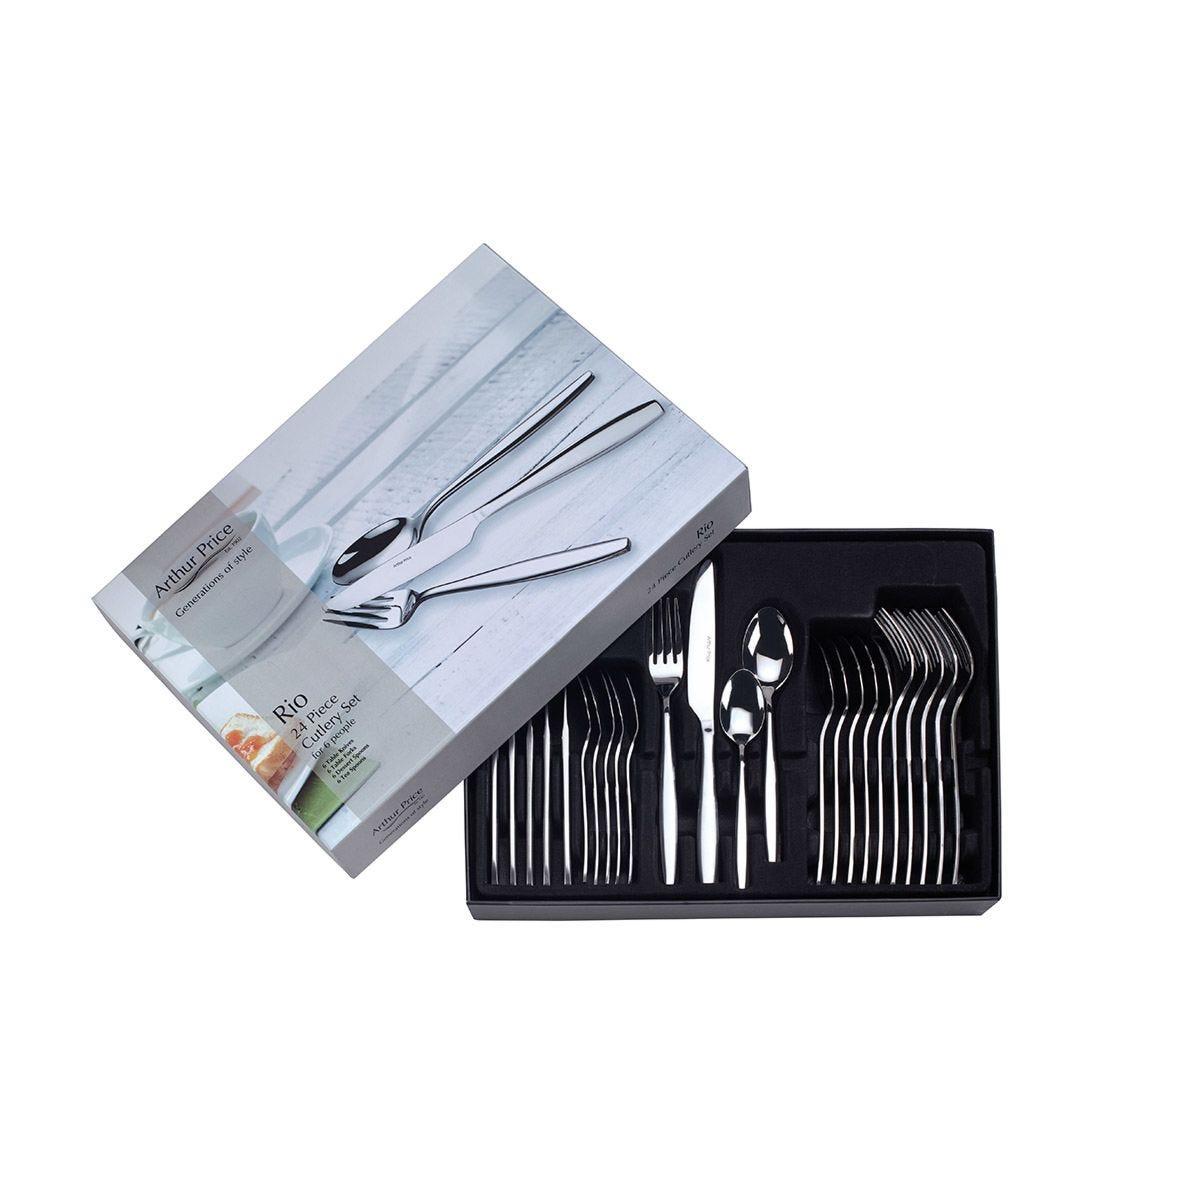 Arthur Price Rio 24-Piece Cutlery Set - Stainless Steel